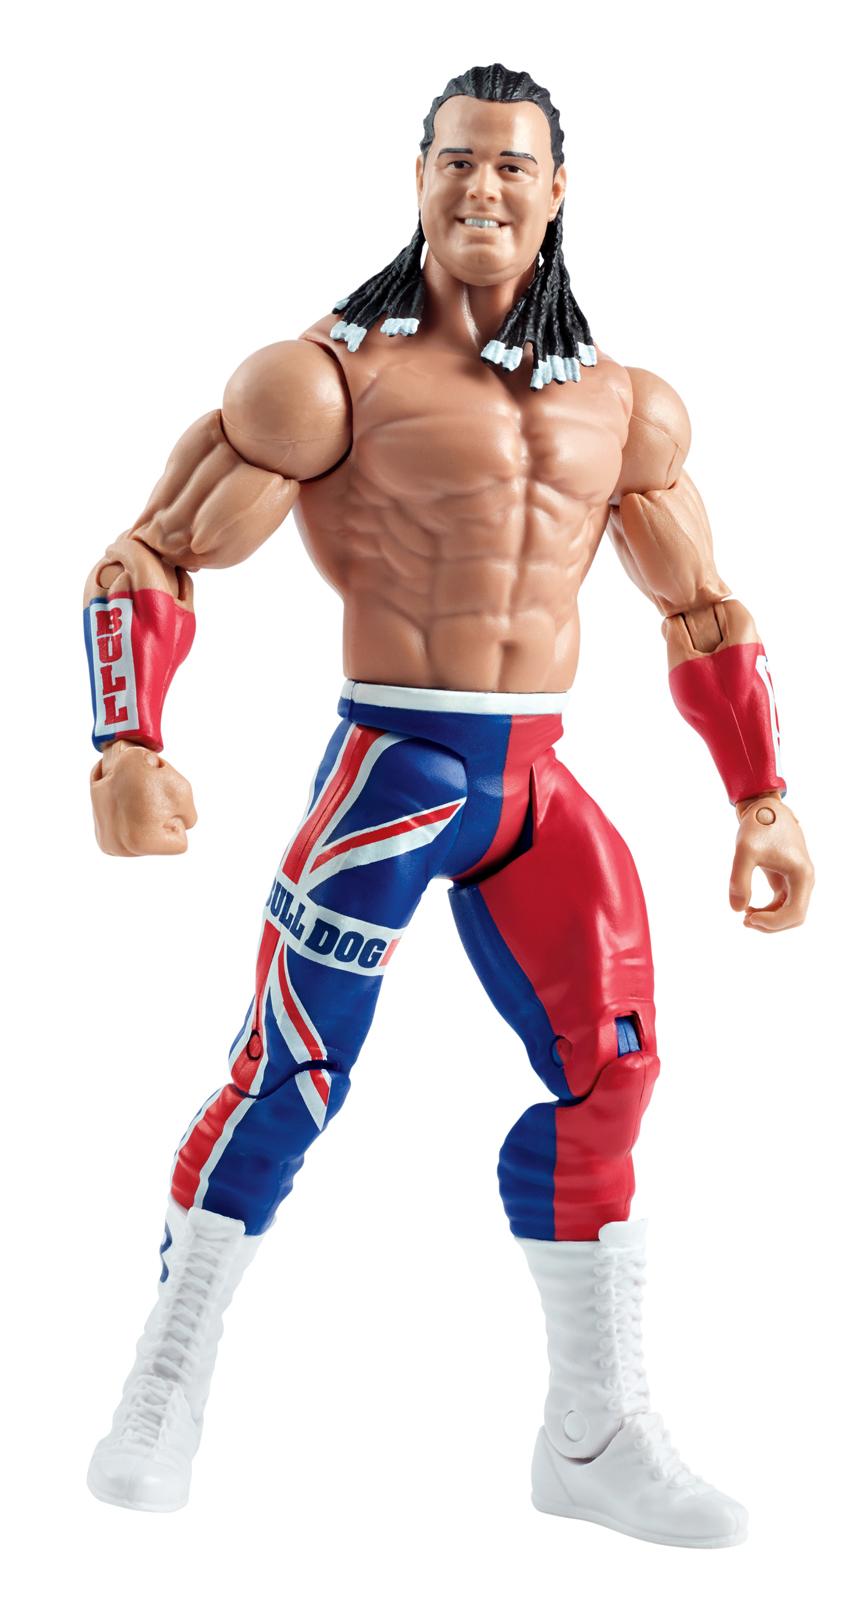 WWE British Bulldog SummerSlam 2016 Series Toy Wrestling